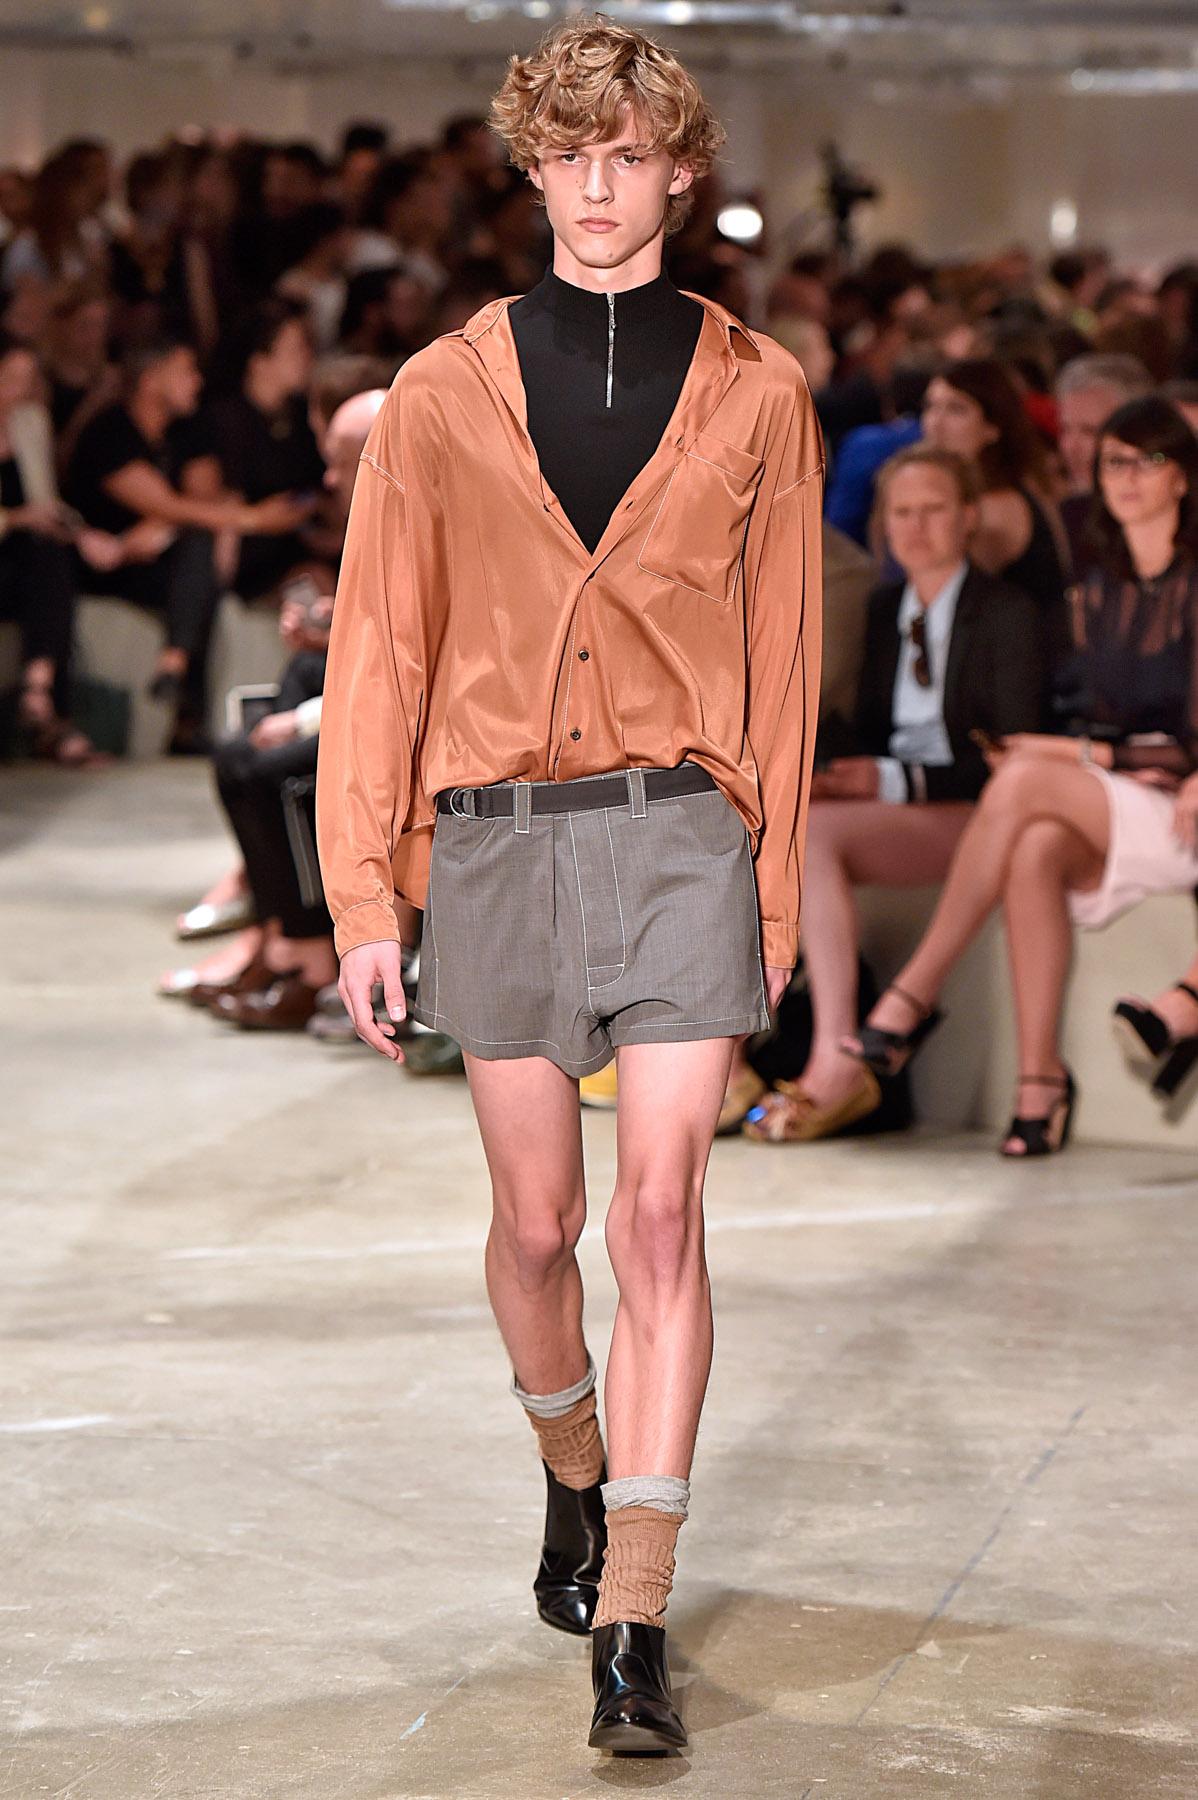 prada spring summer 2016 menswear collection milan fashion week the fashionisto. Black Bedroom Furniture Sets. Home Design Ideas